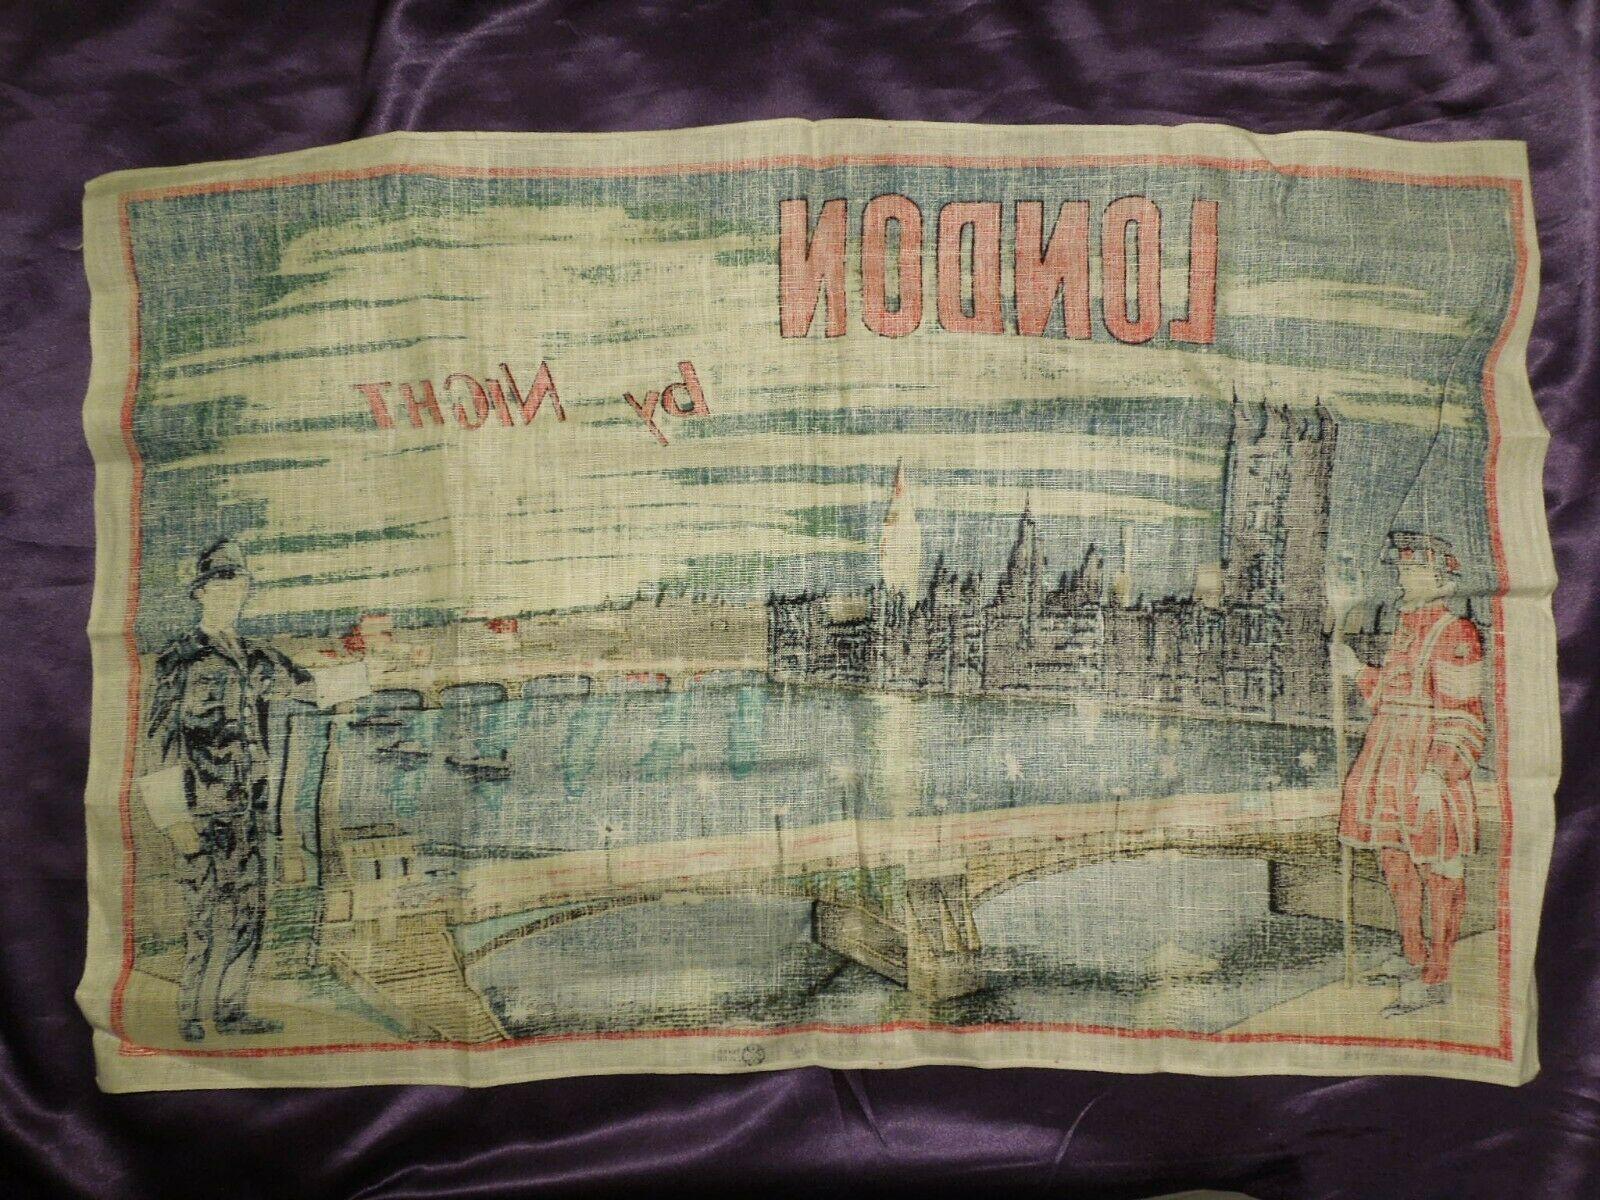 Vintage London by Night by Blackstaff Pure Irish Linen Towel Art image 11